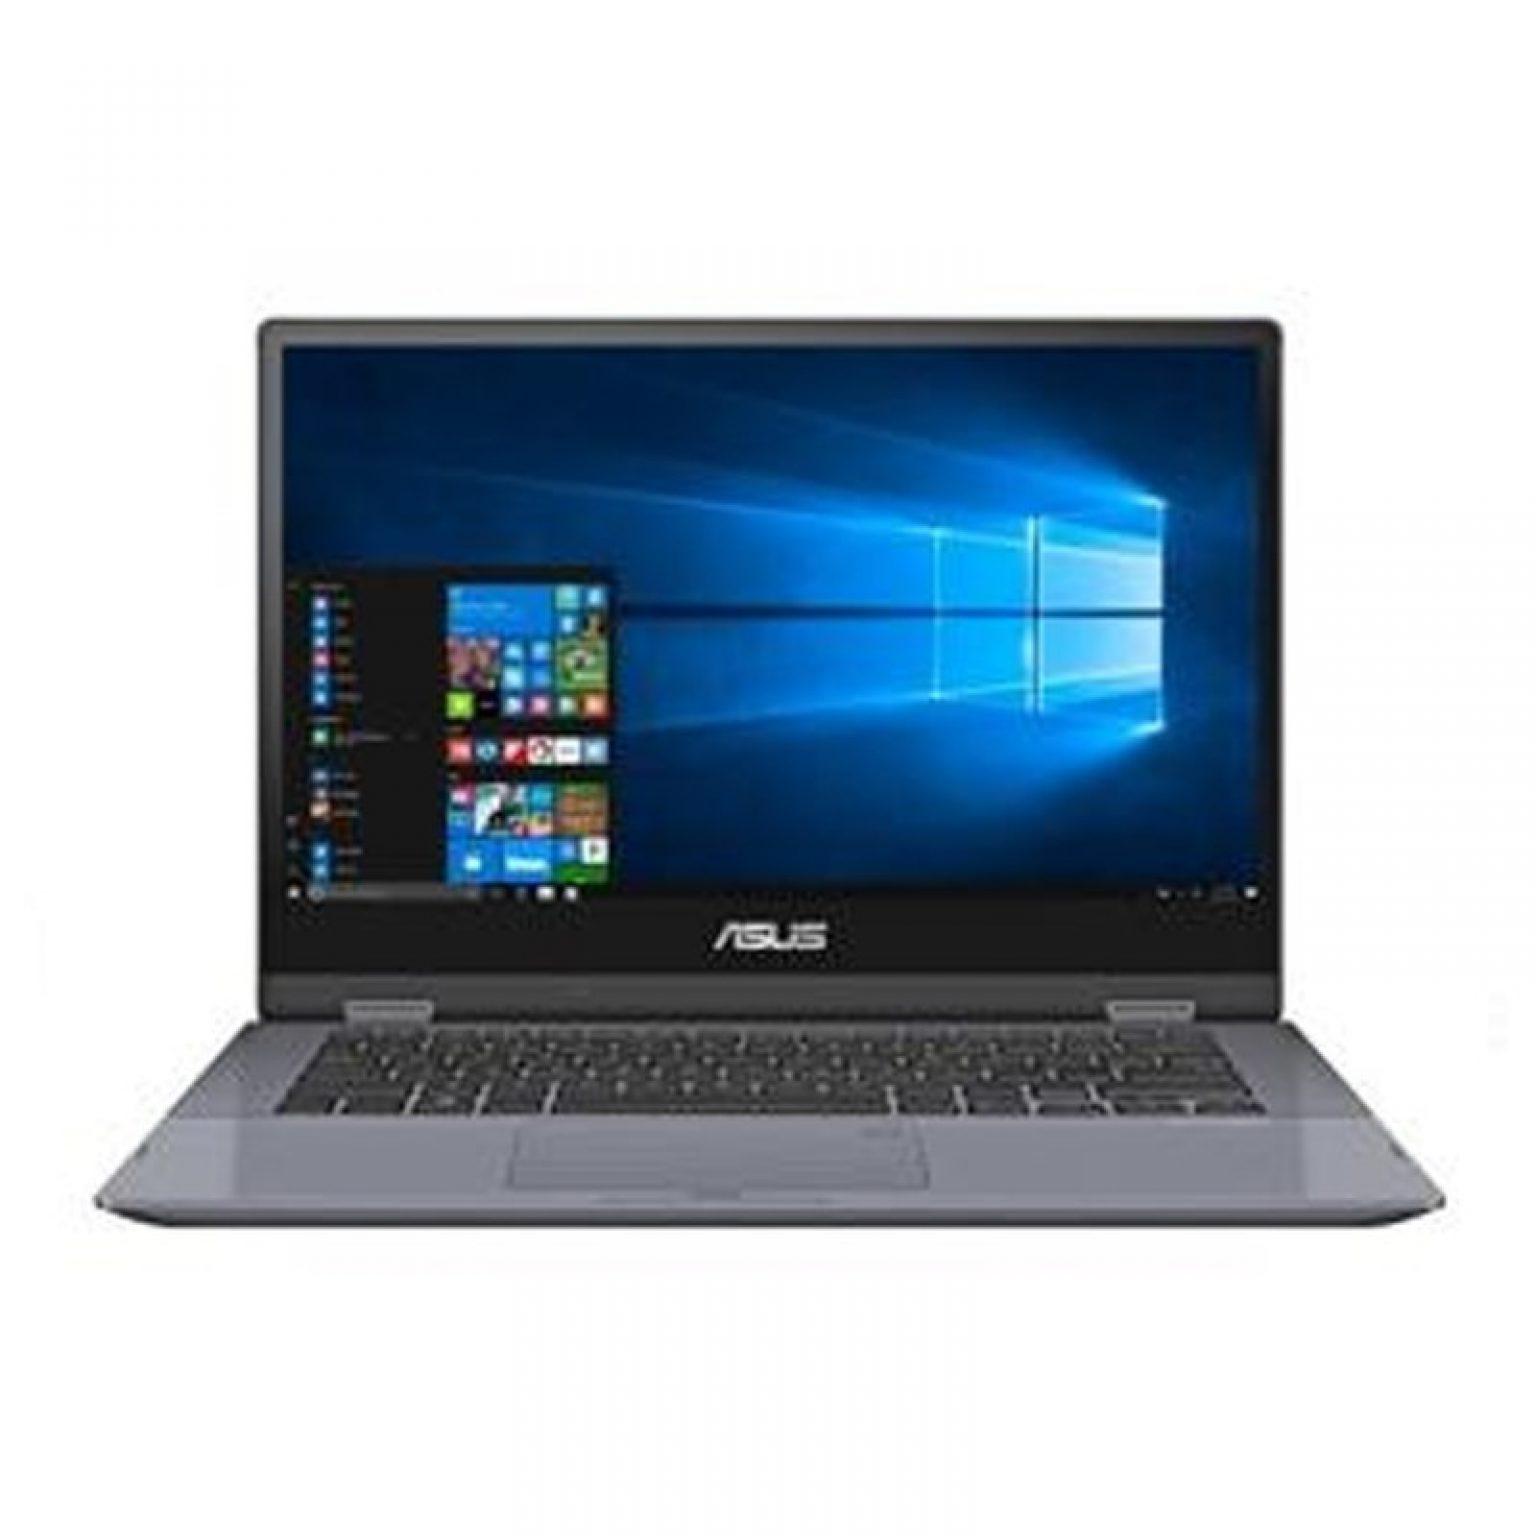 ASUS - VivoBook Flip TP412UA-EC502T (i5-8250U/4GB RAM/256GB/14inch/Win10SL/Silver Blue)